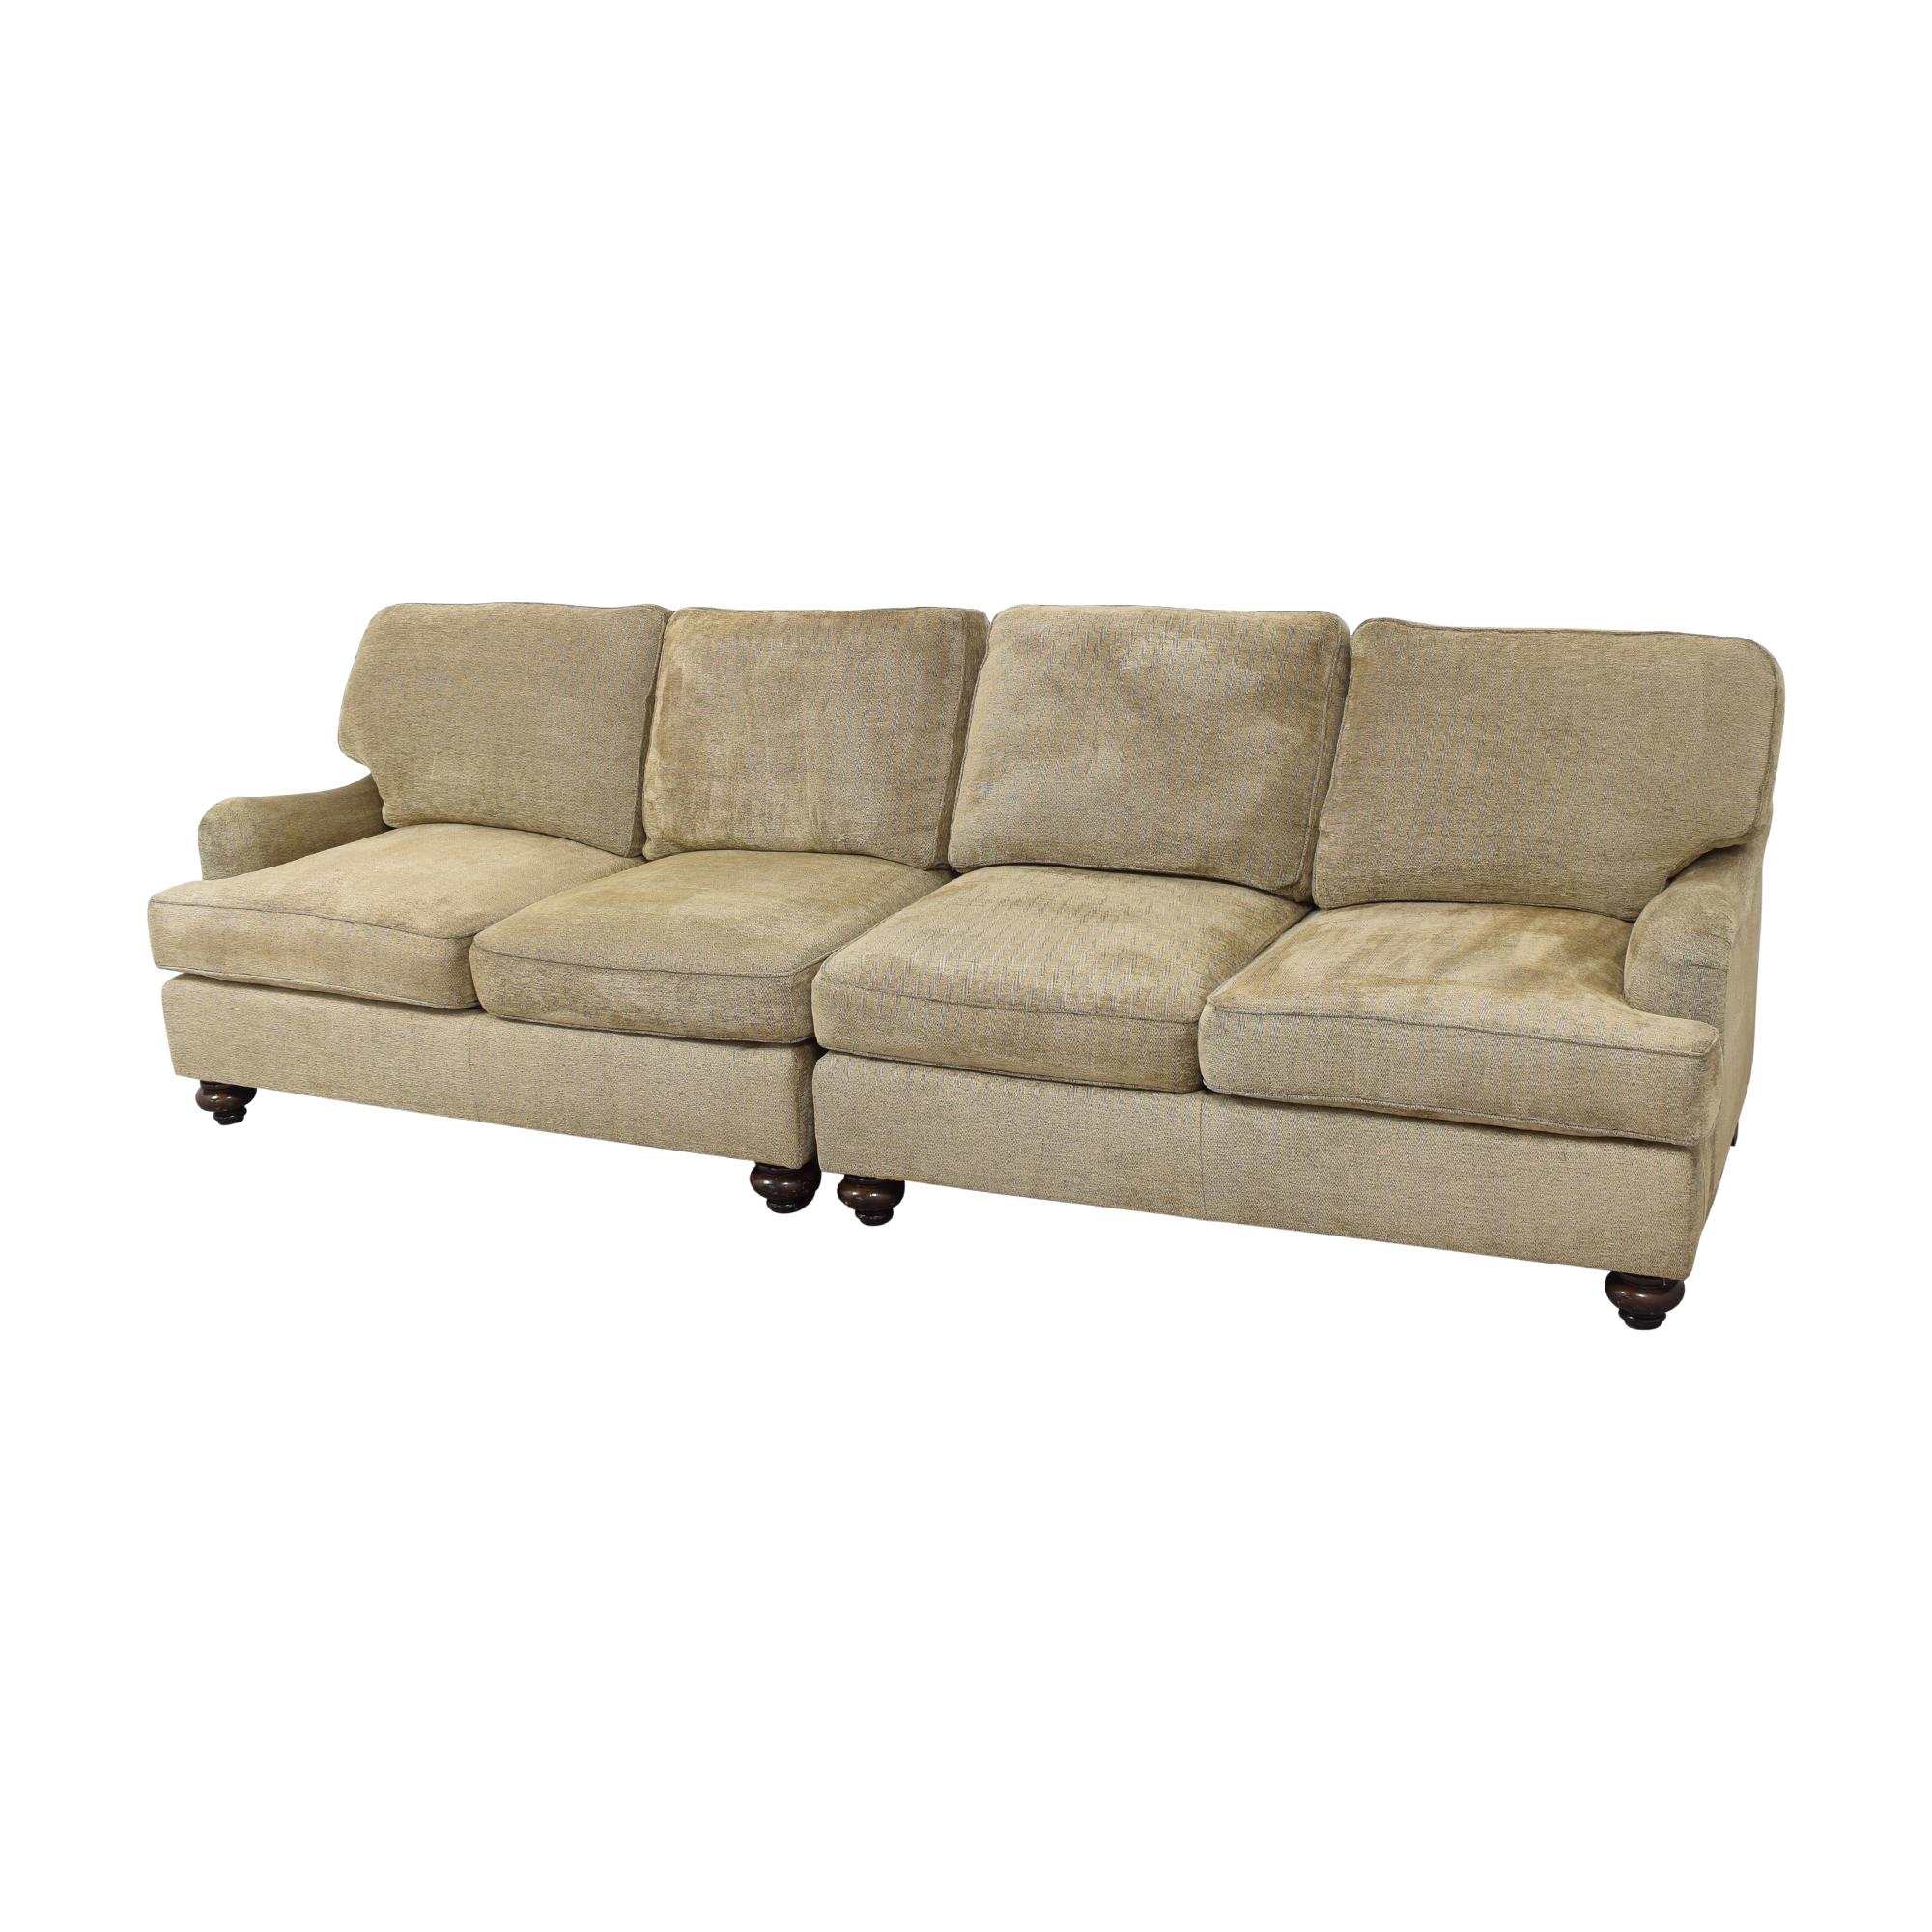 Henredon Furniture Henredon Furniture Mid-Century Modern Couch nyc